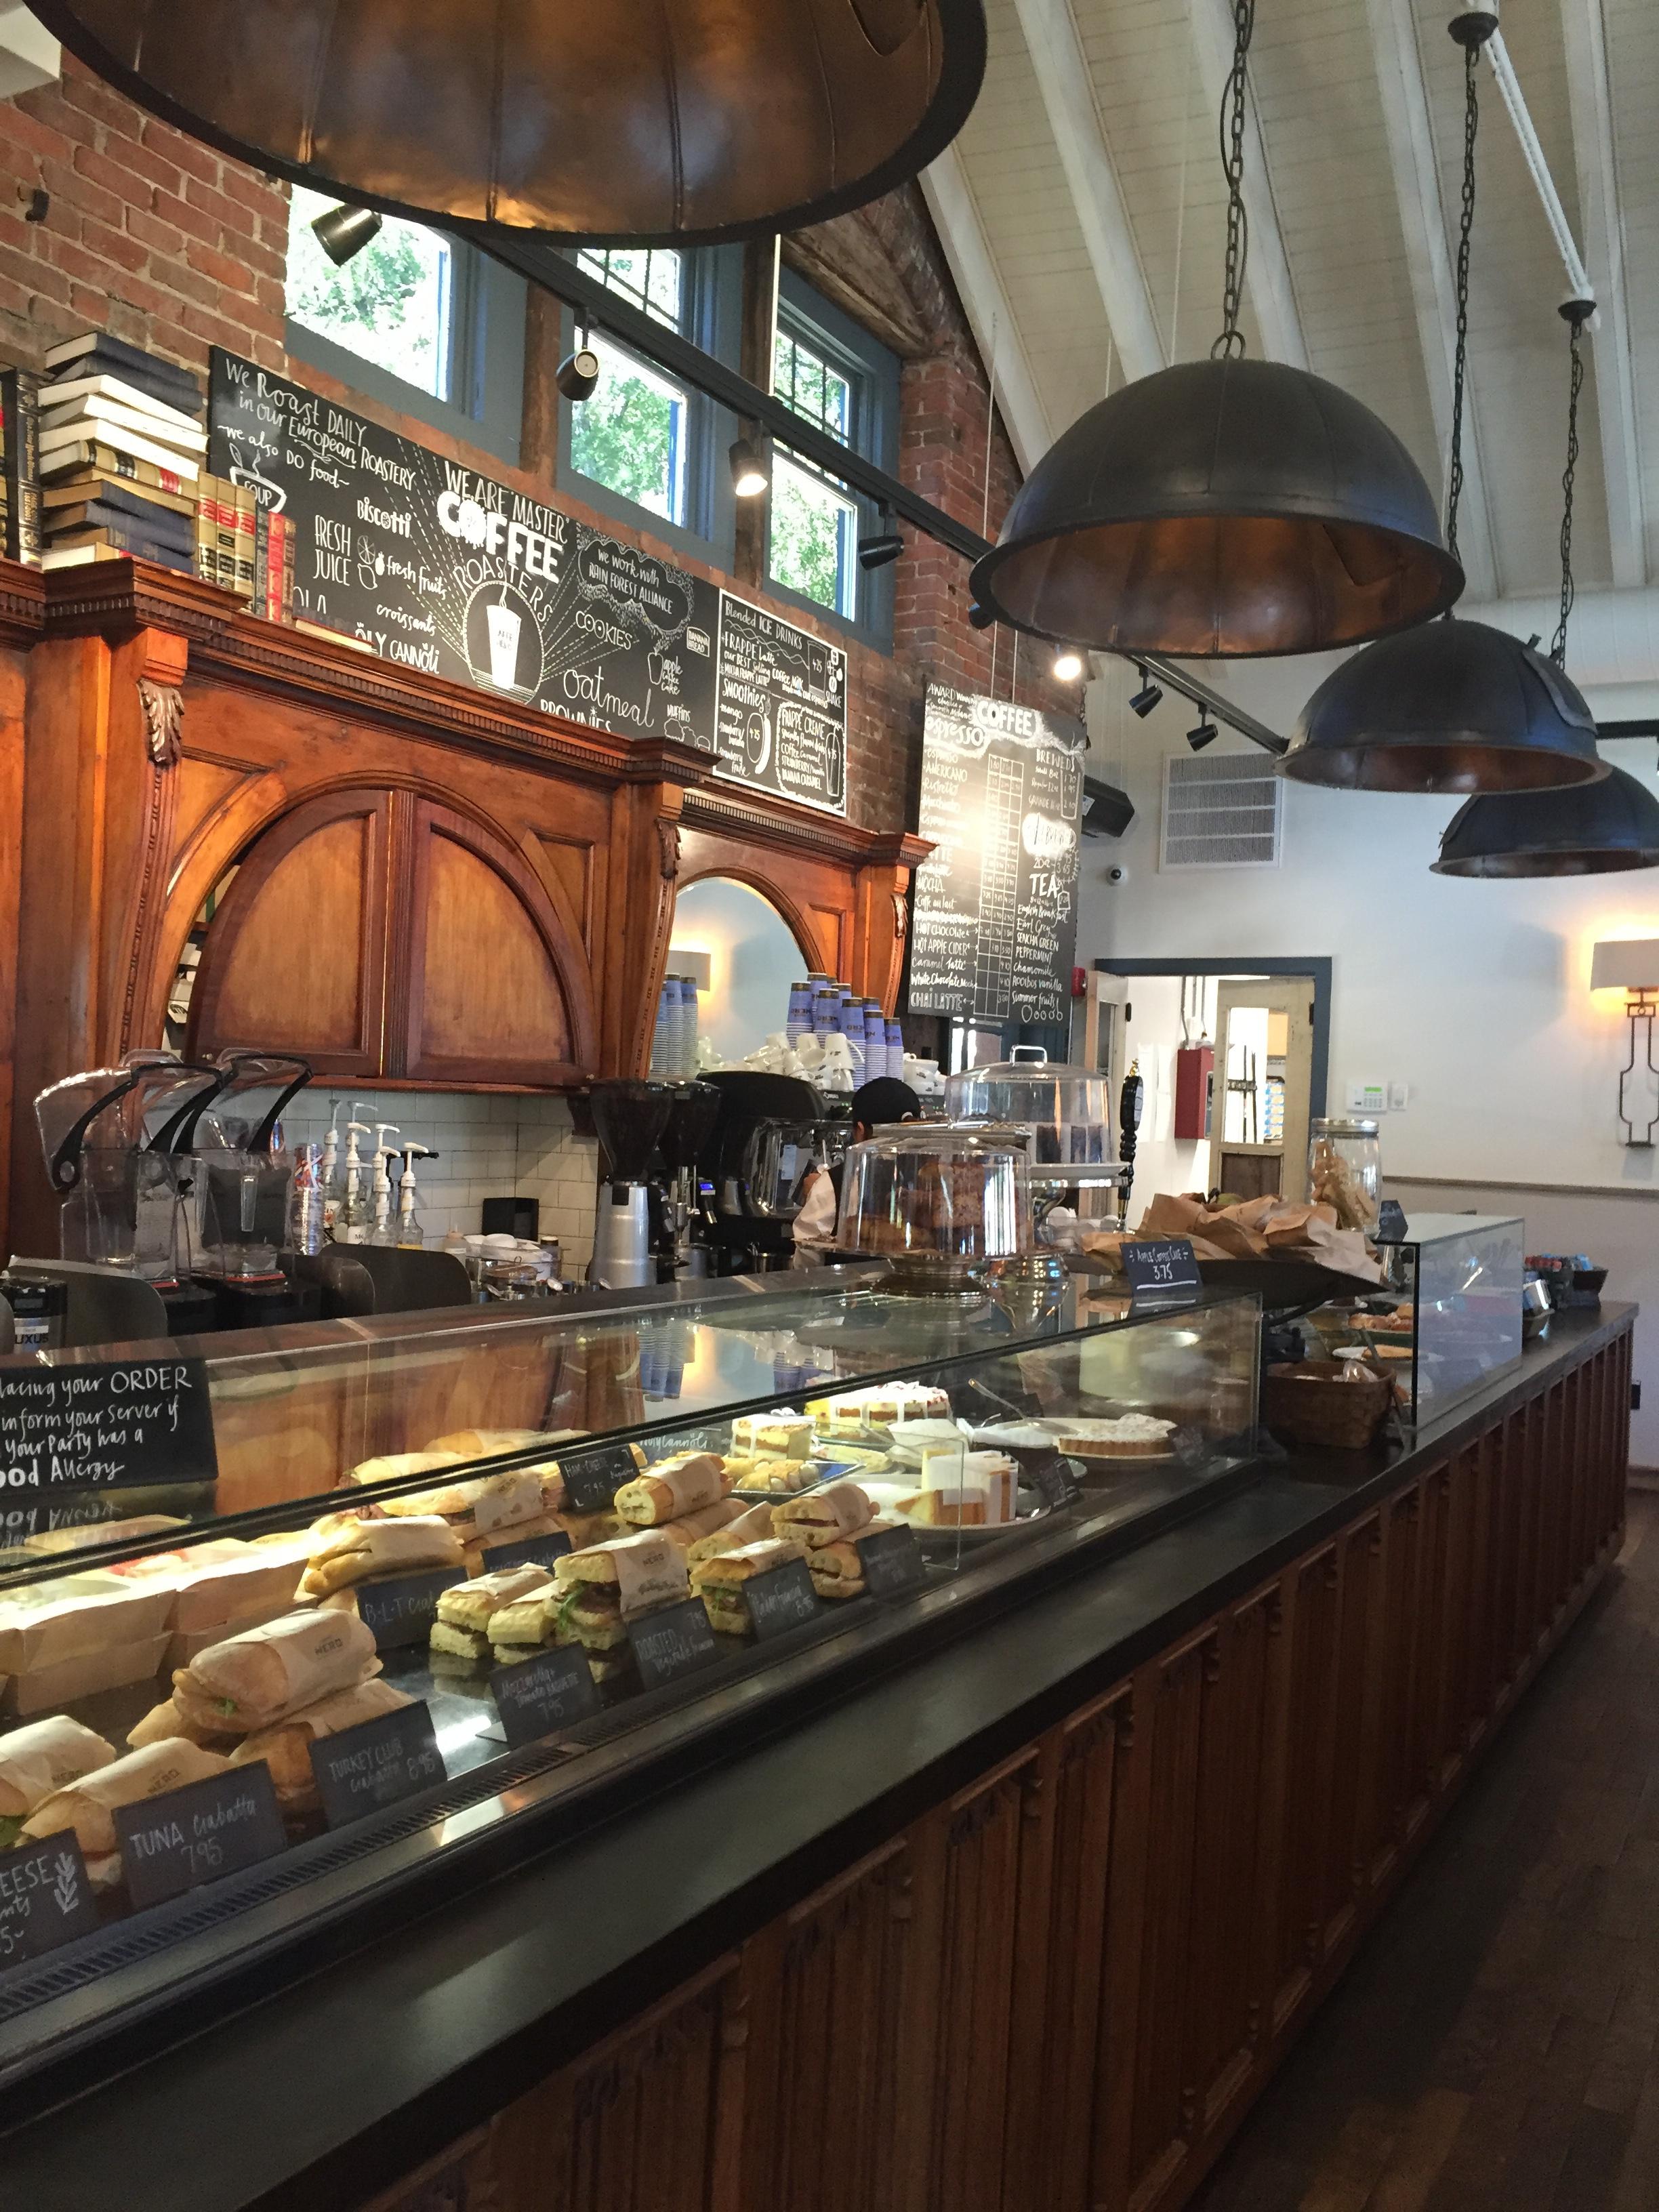 Home Goods Couches: Caffè Nero: Charming, But Still A Chain